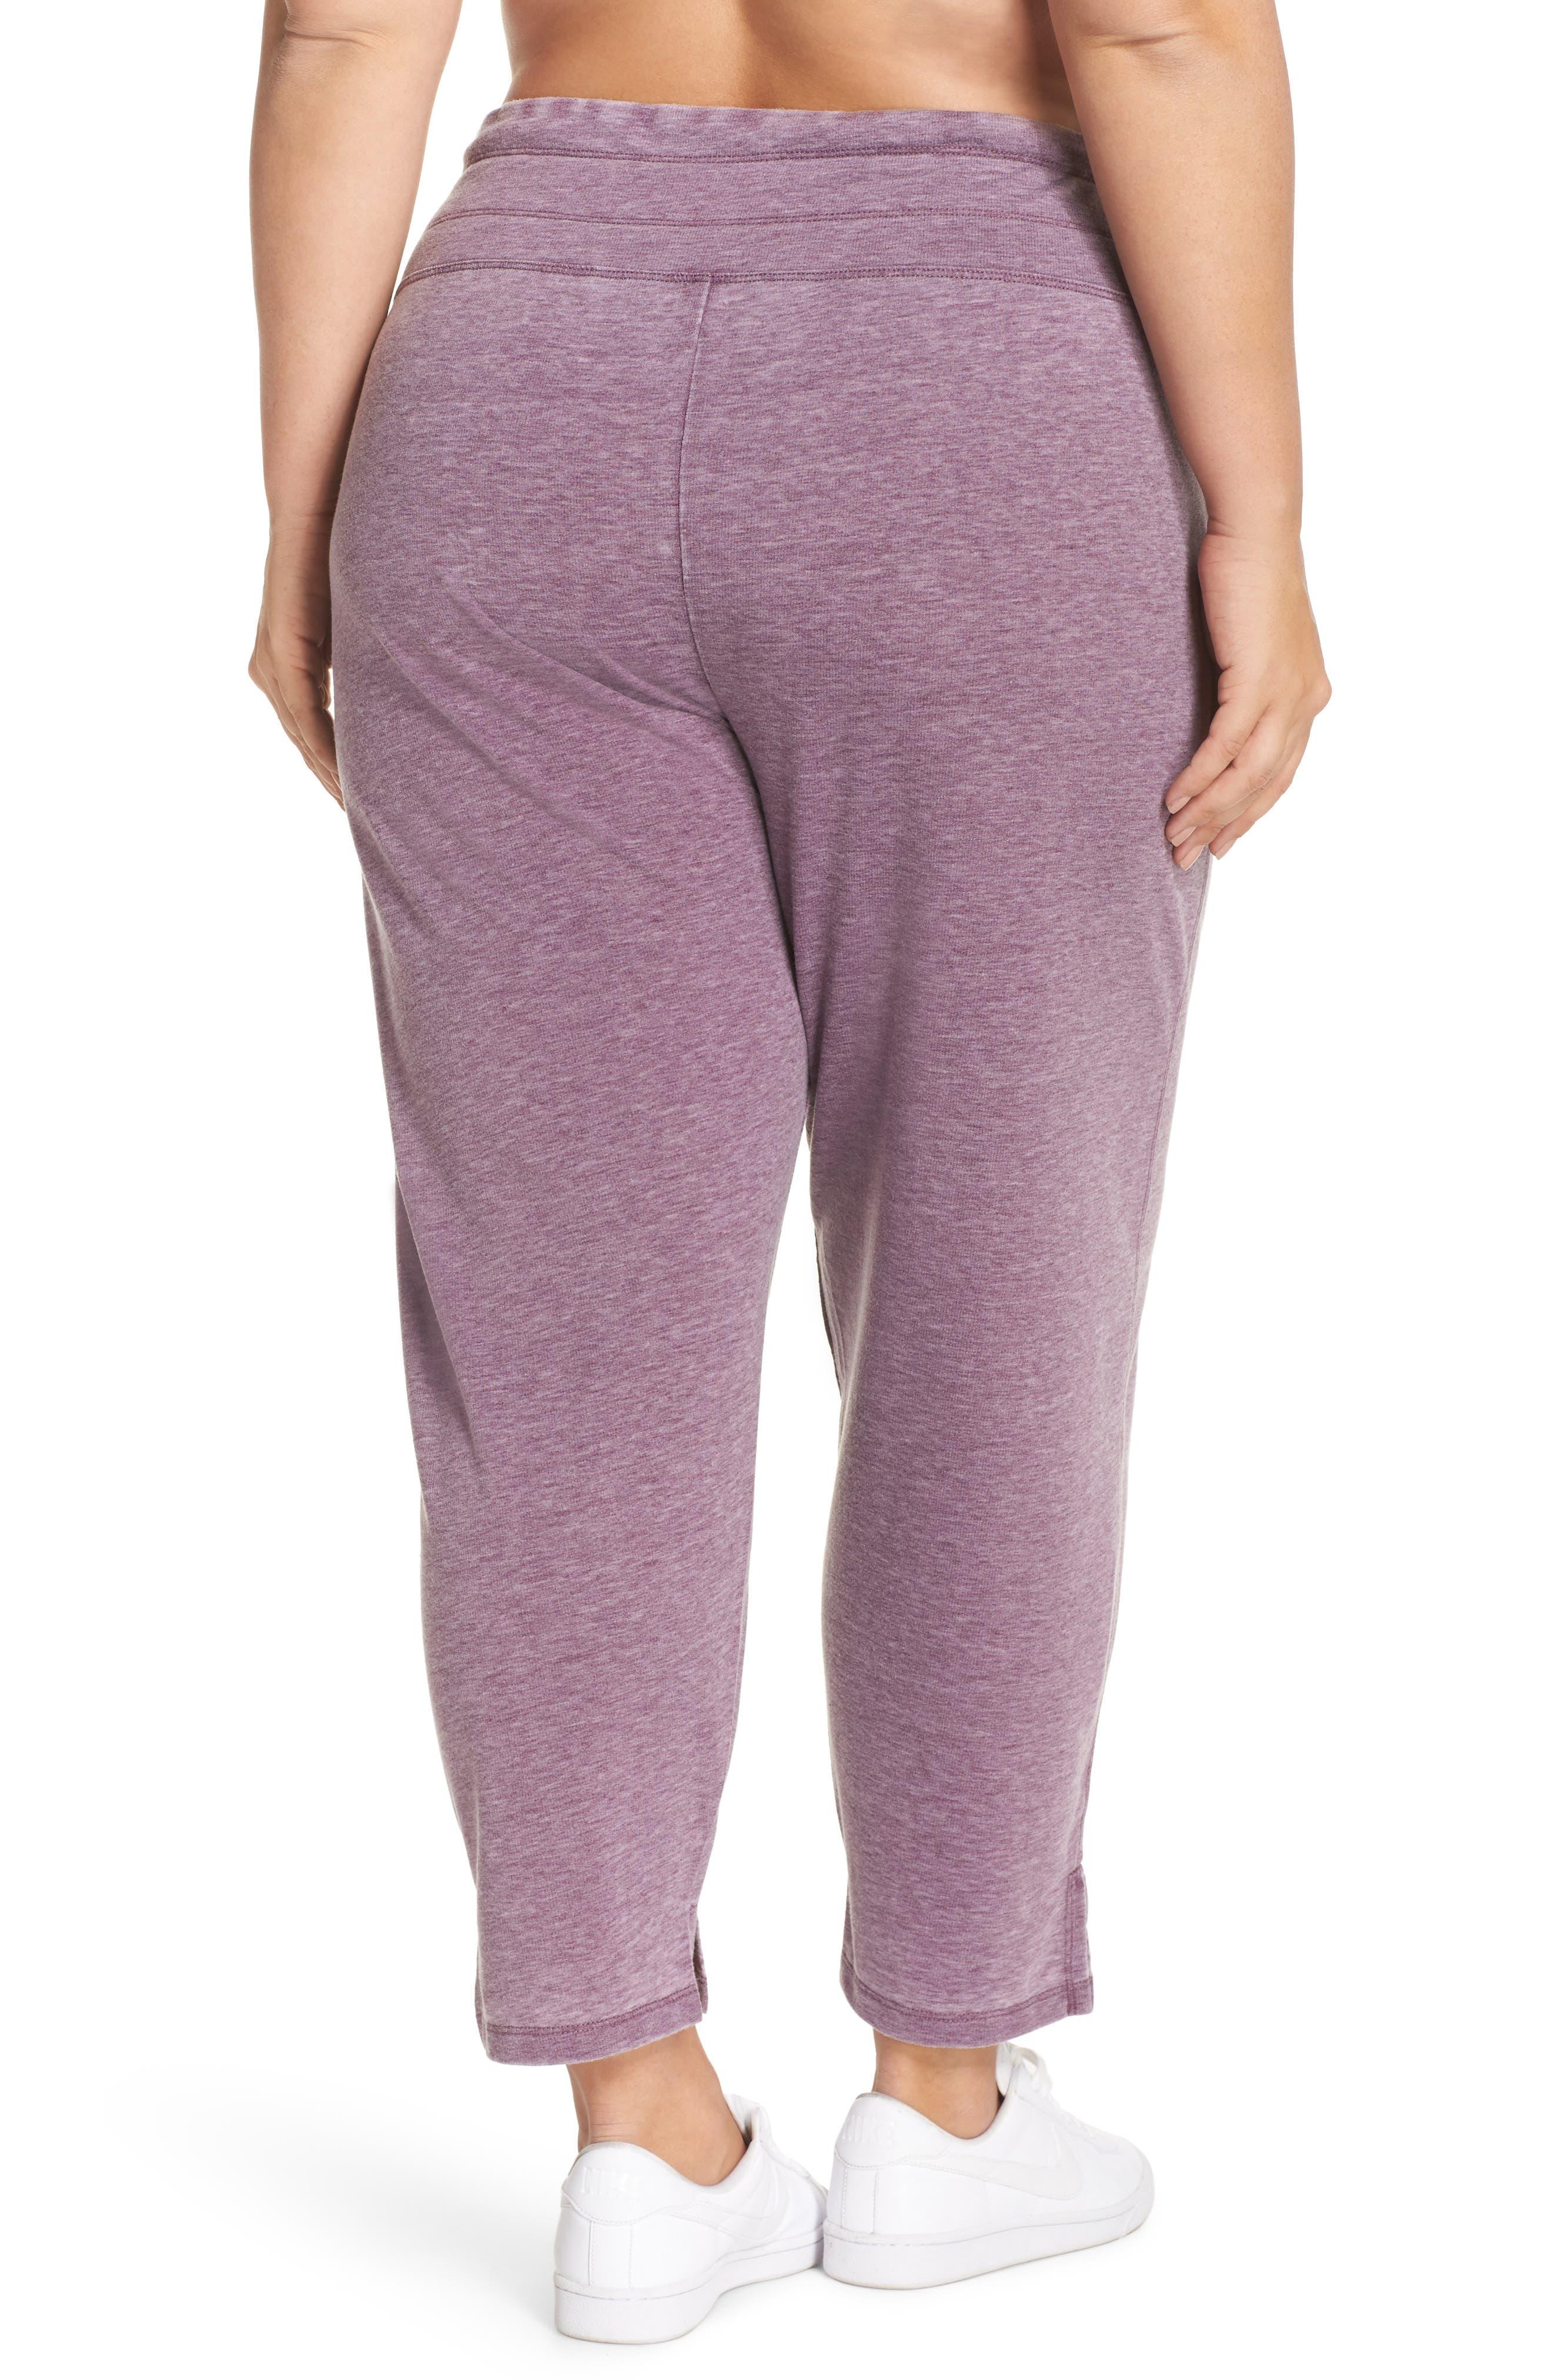 Kayle Crop Sweatpants,                             Alternate thumbnail 2, color,                             Aubergine Glow